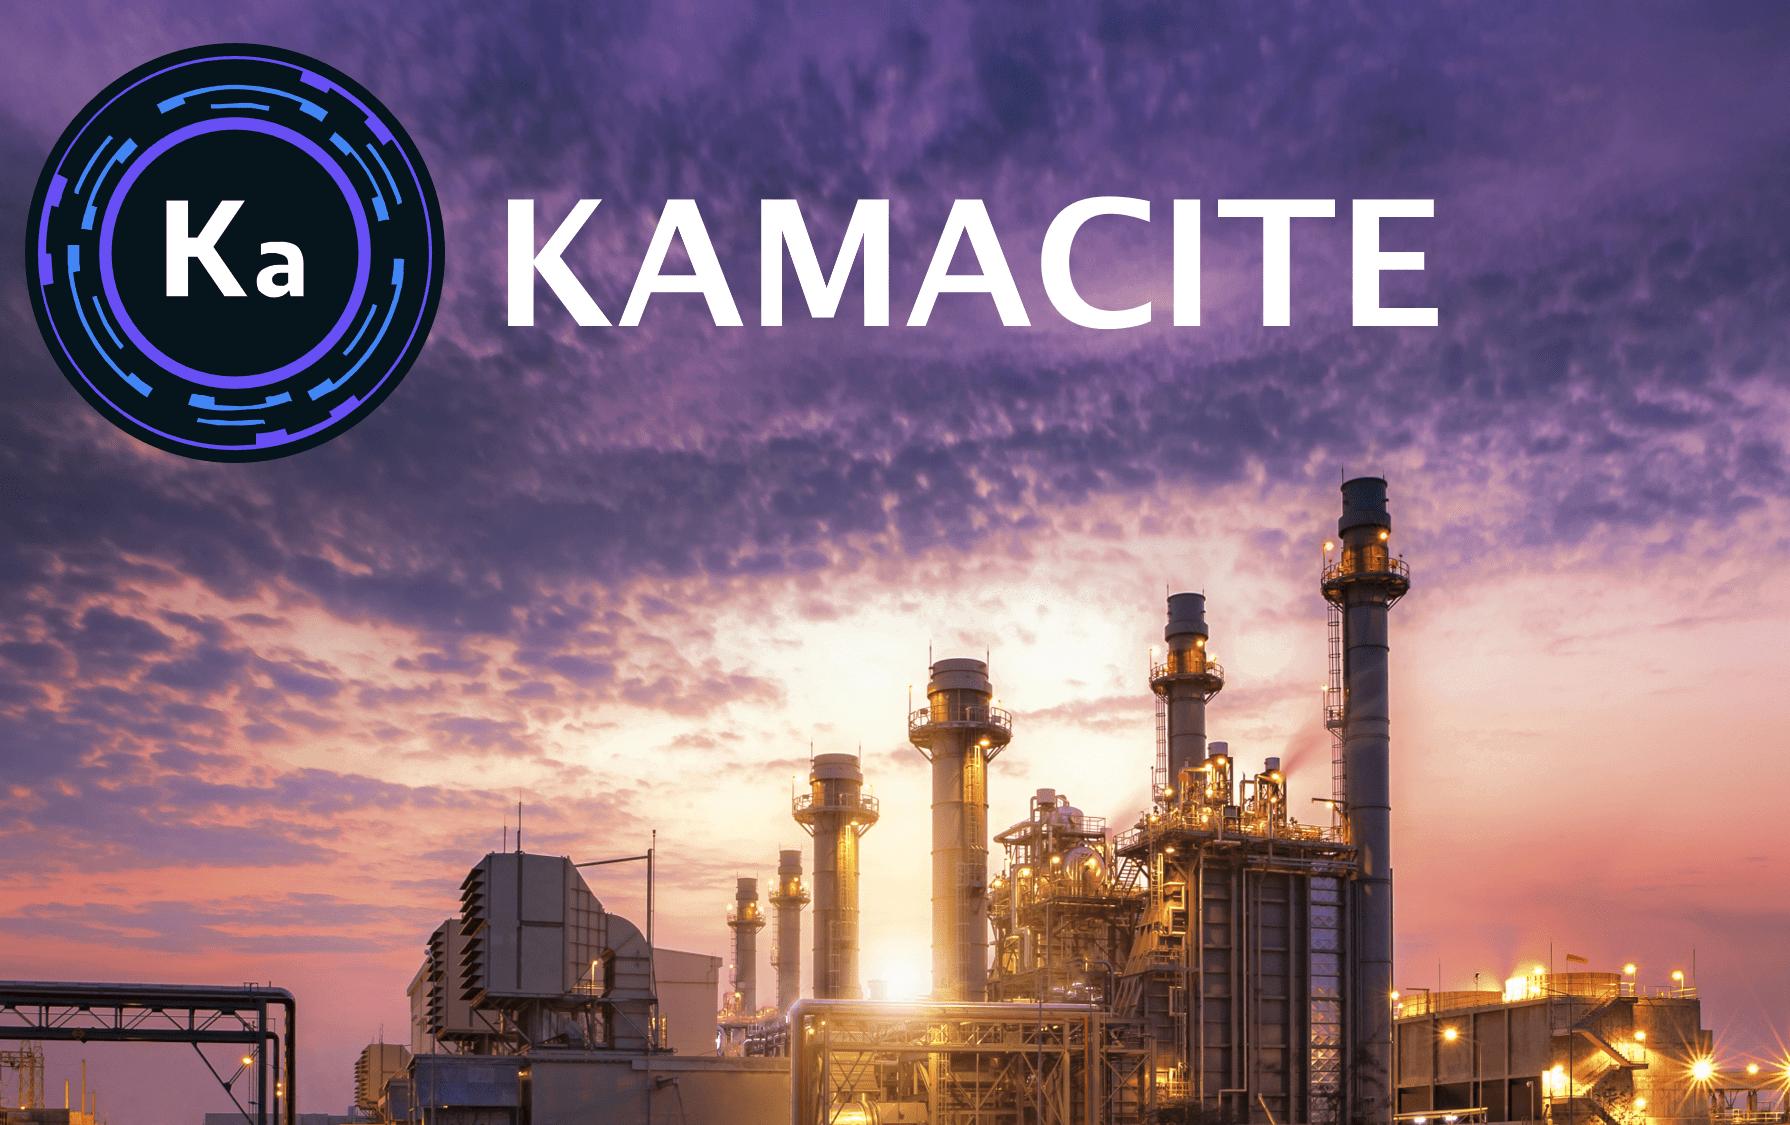 ICS Threat Activity Group KAMACITE